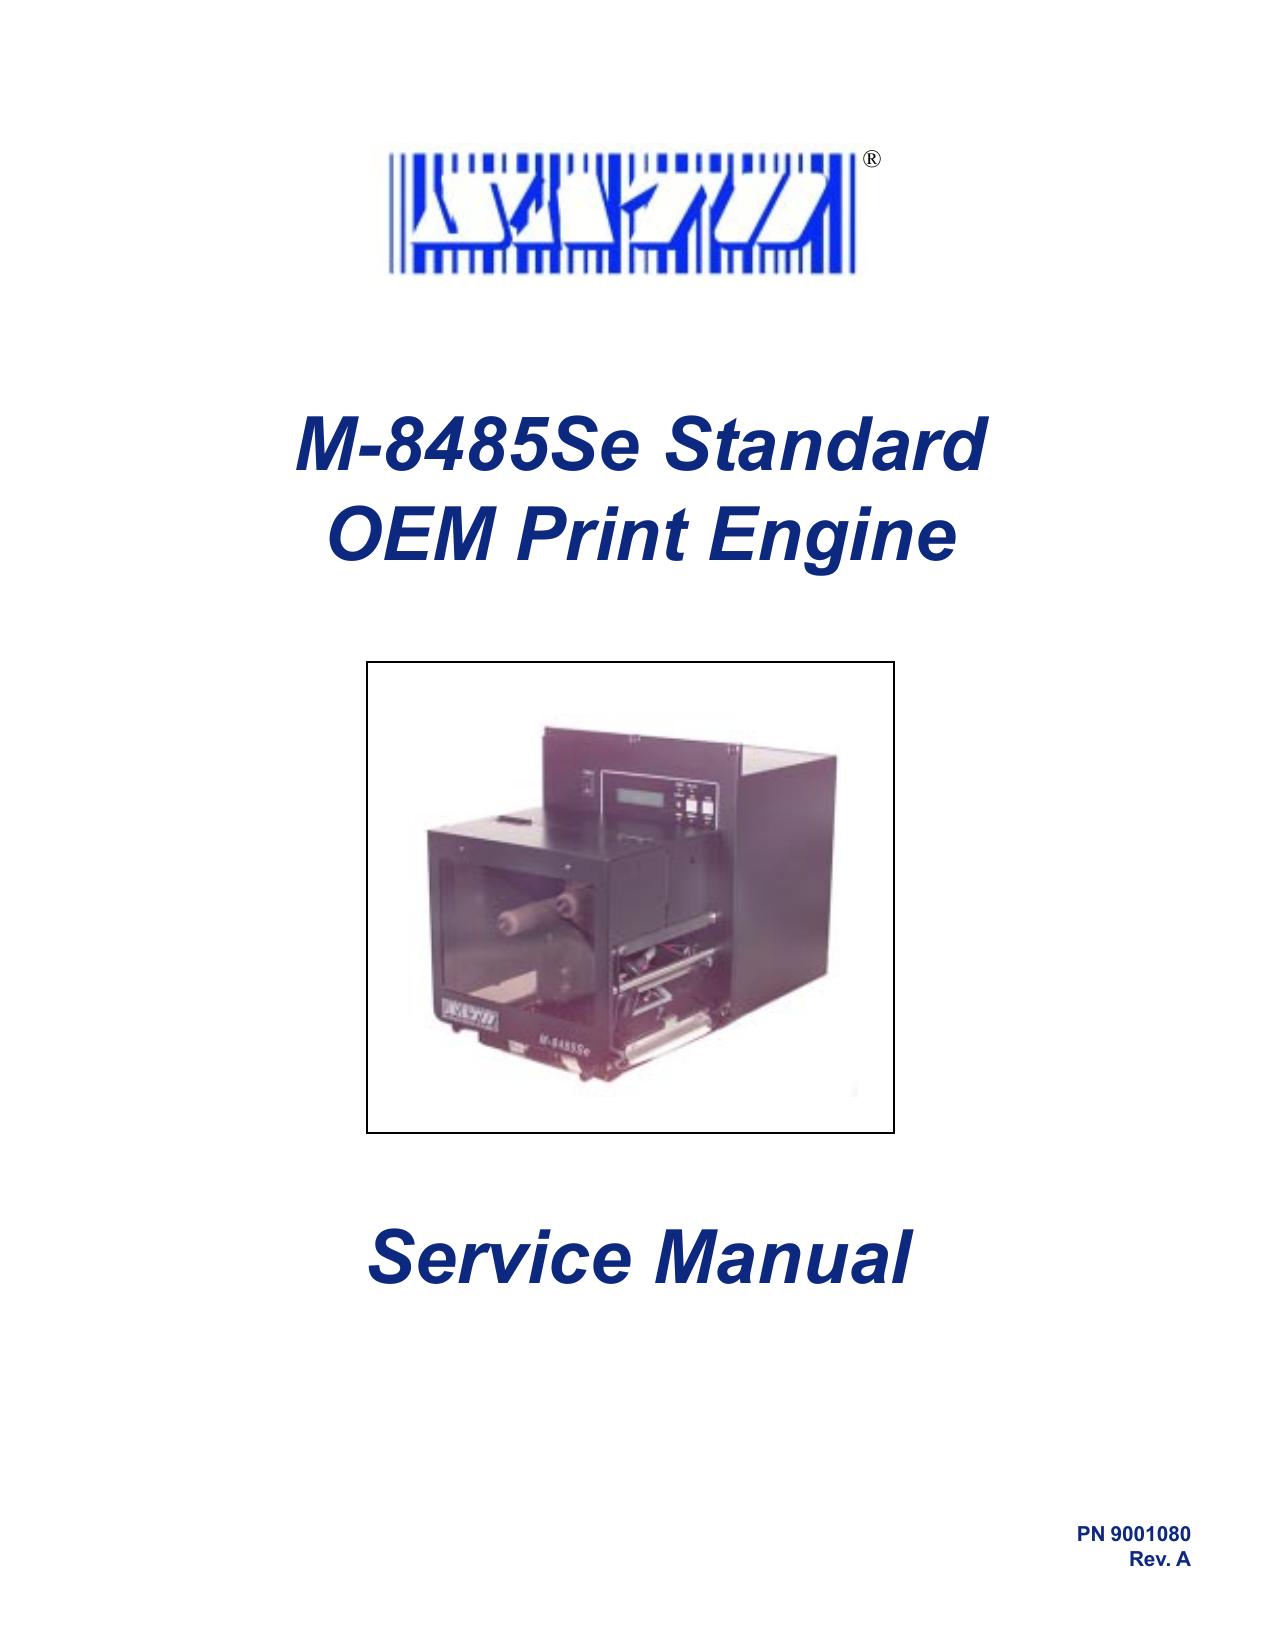 sato m8485se service manual manualzz com rh manualzz com sato printer m8485se manual